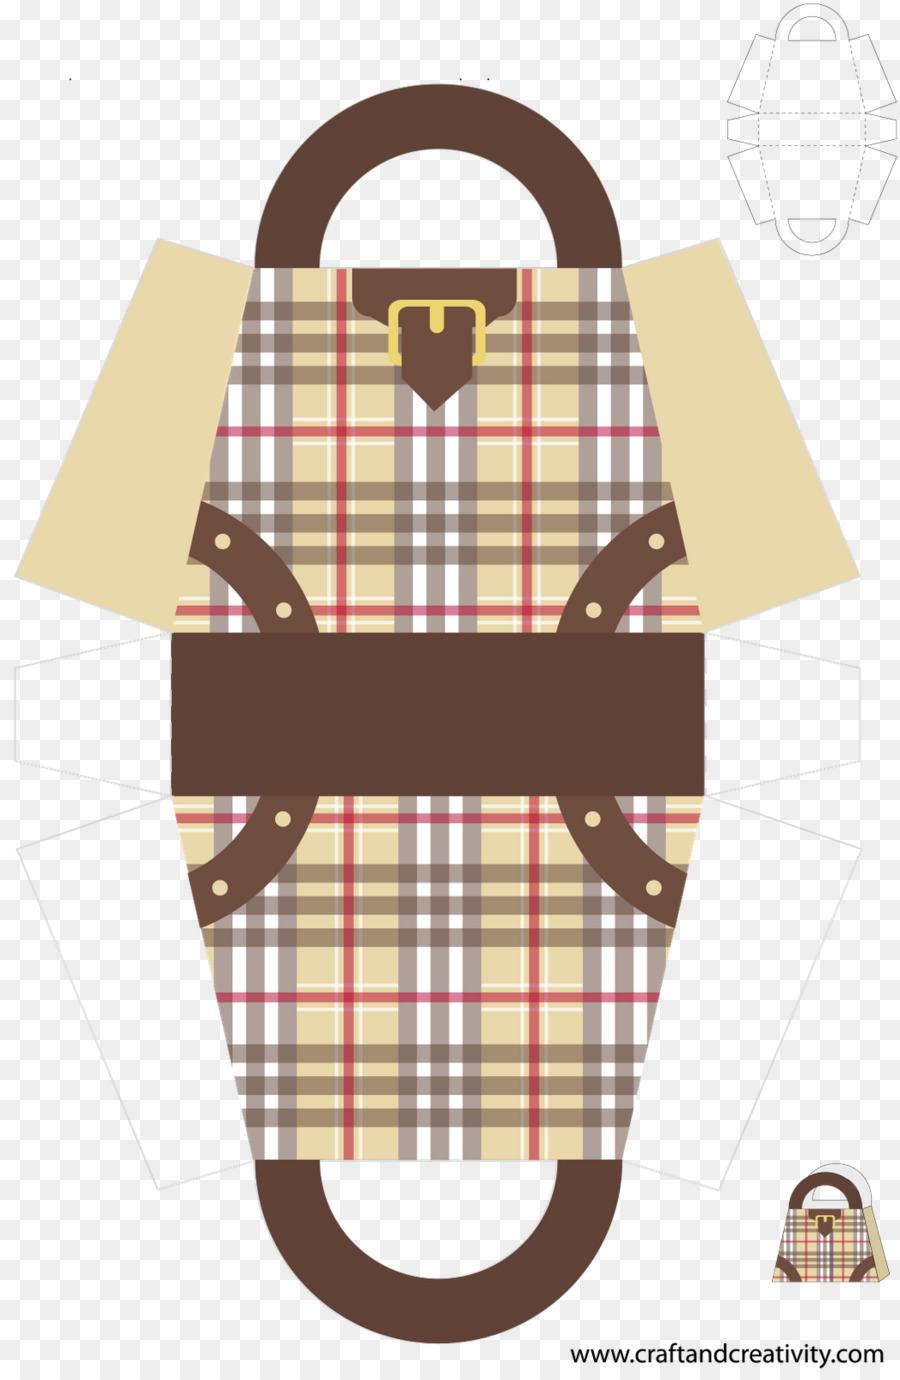 Paper Bag Handbag Mothers Day Bags Template Png Download 1047